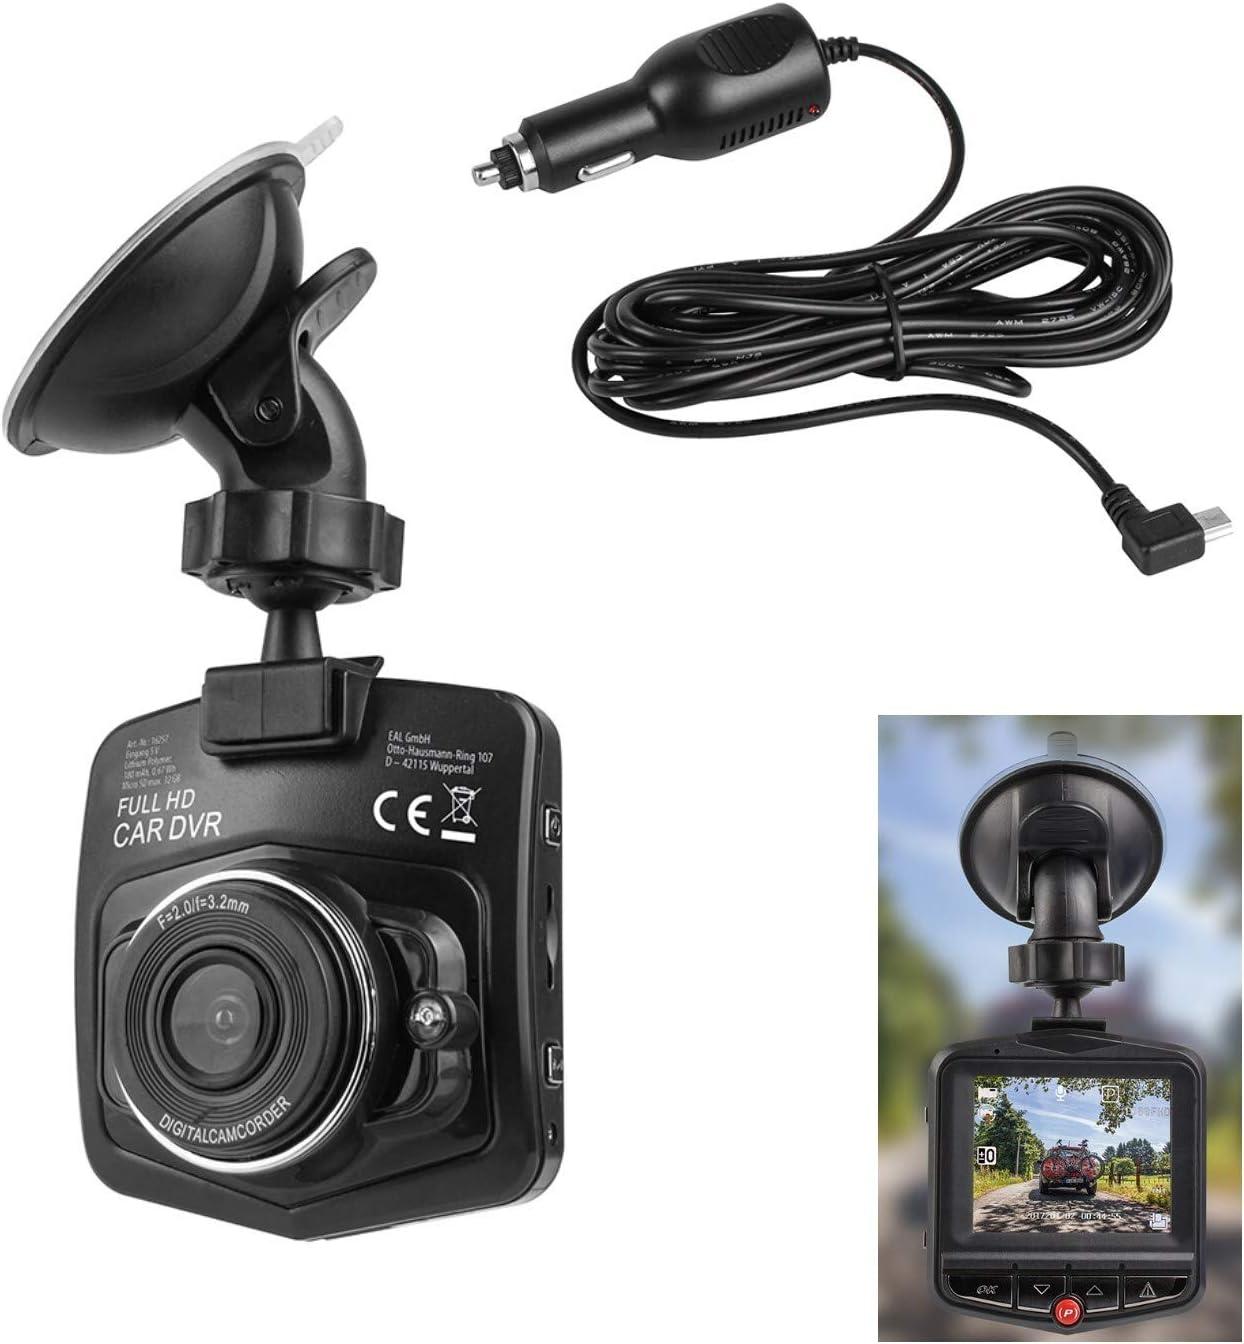 Kfz Dashboard Kamera 32gb Sd Karte 1080 Full Hd Dashcam Nachtsicht Autokamera Auto